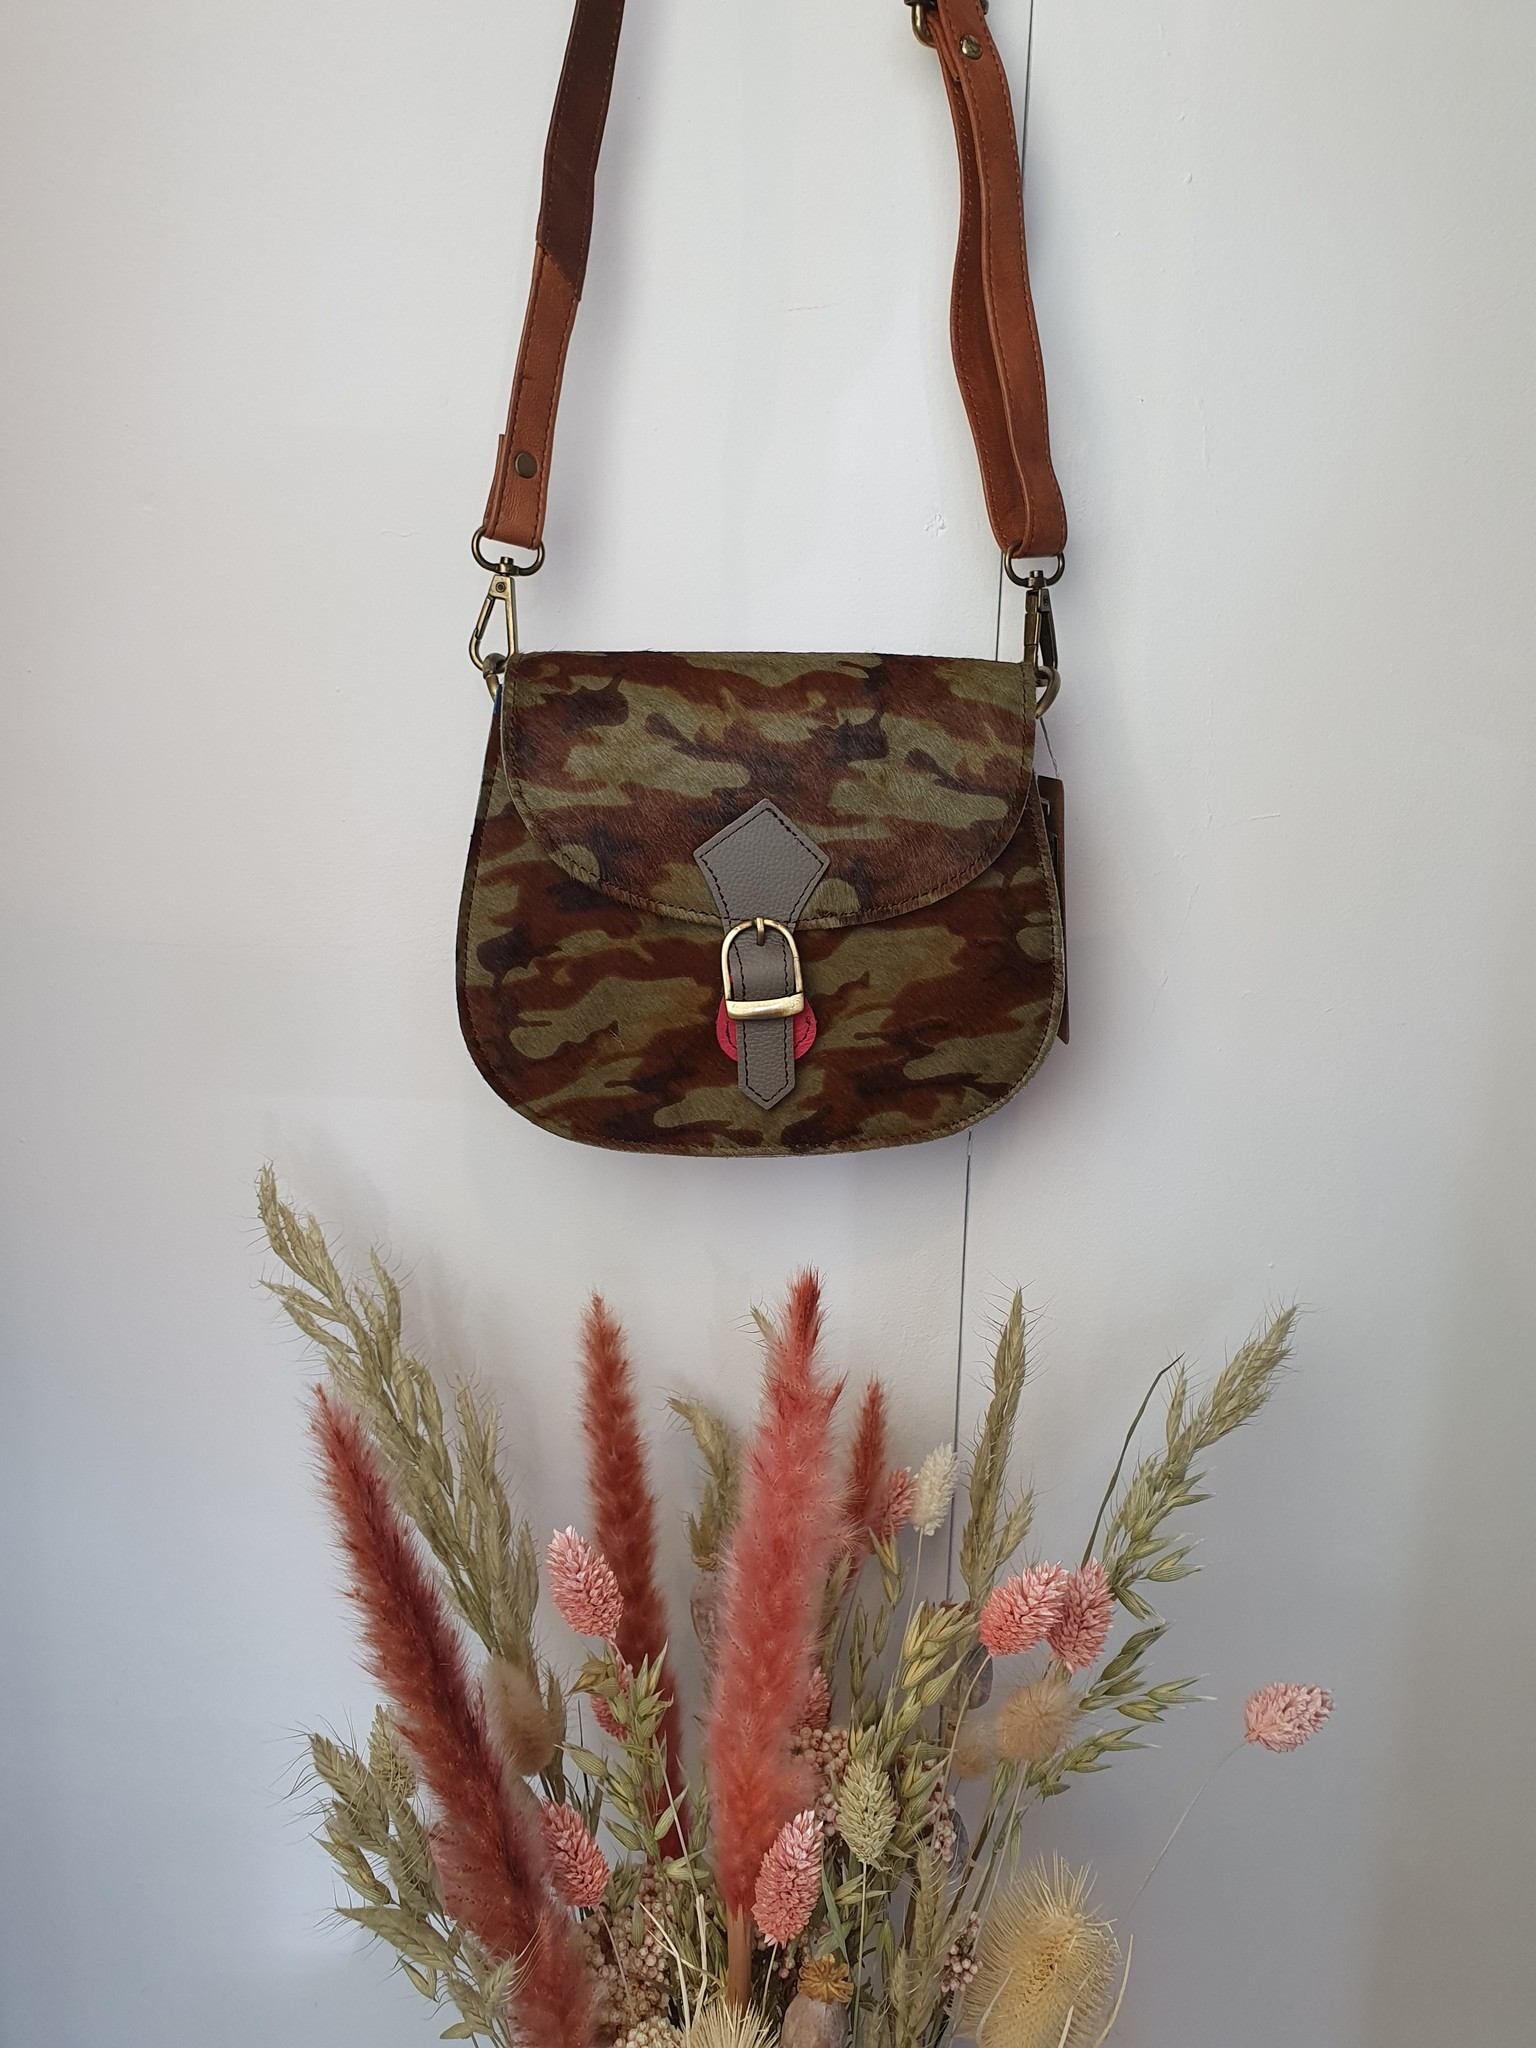 Tassenloodz Tassenloodz Mini Animal bag 1028